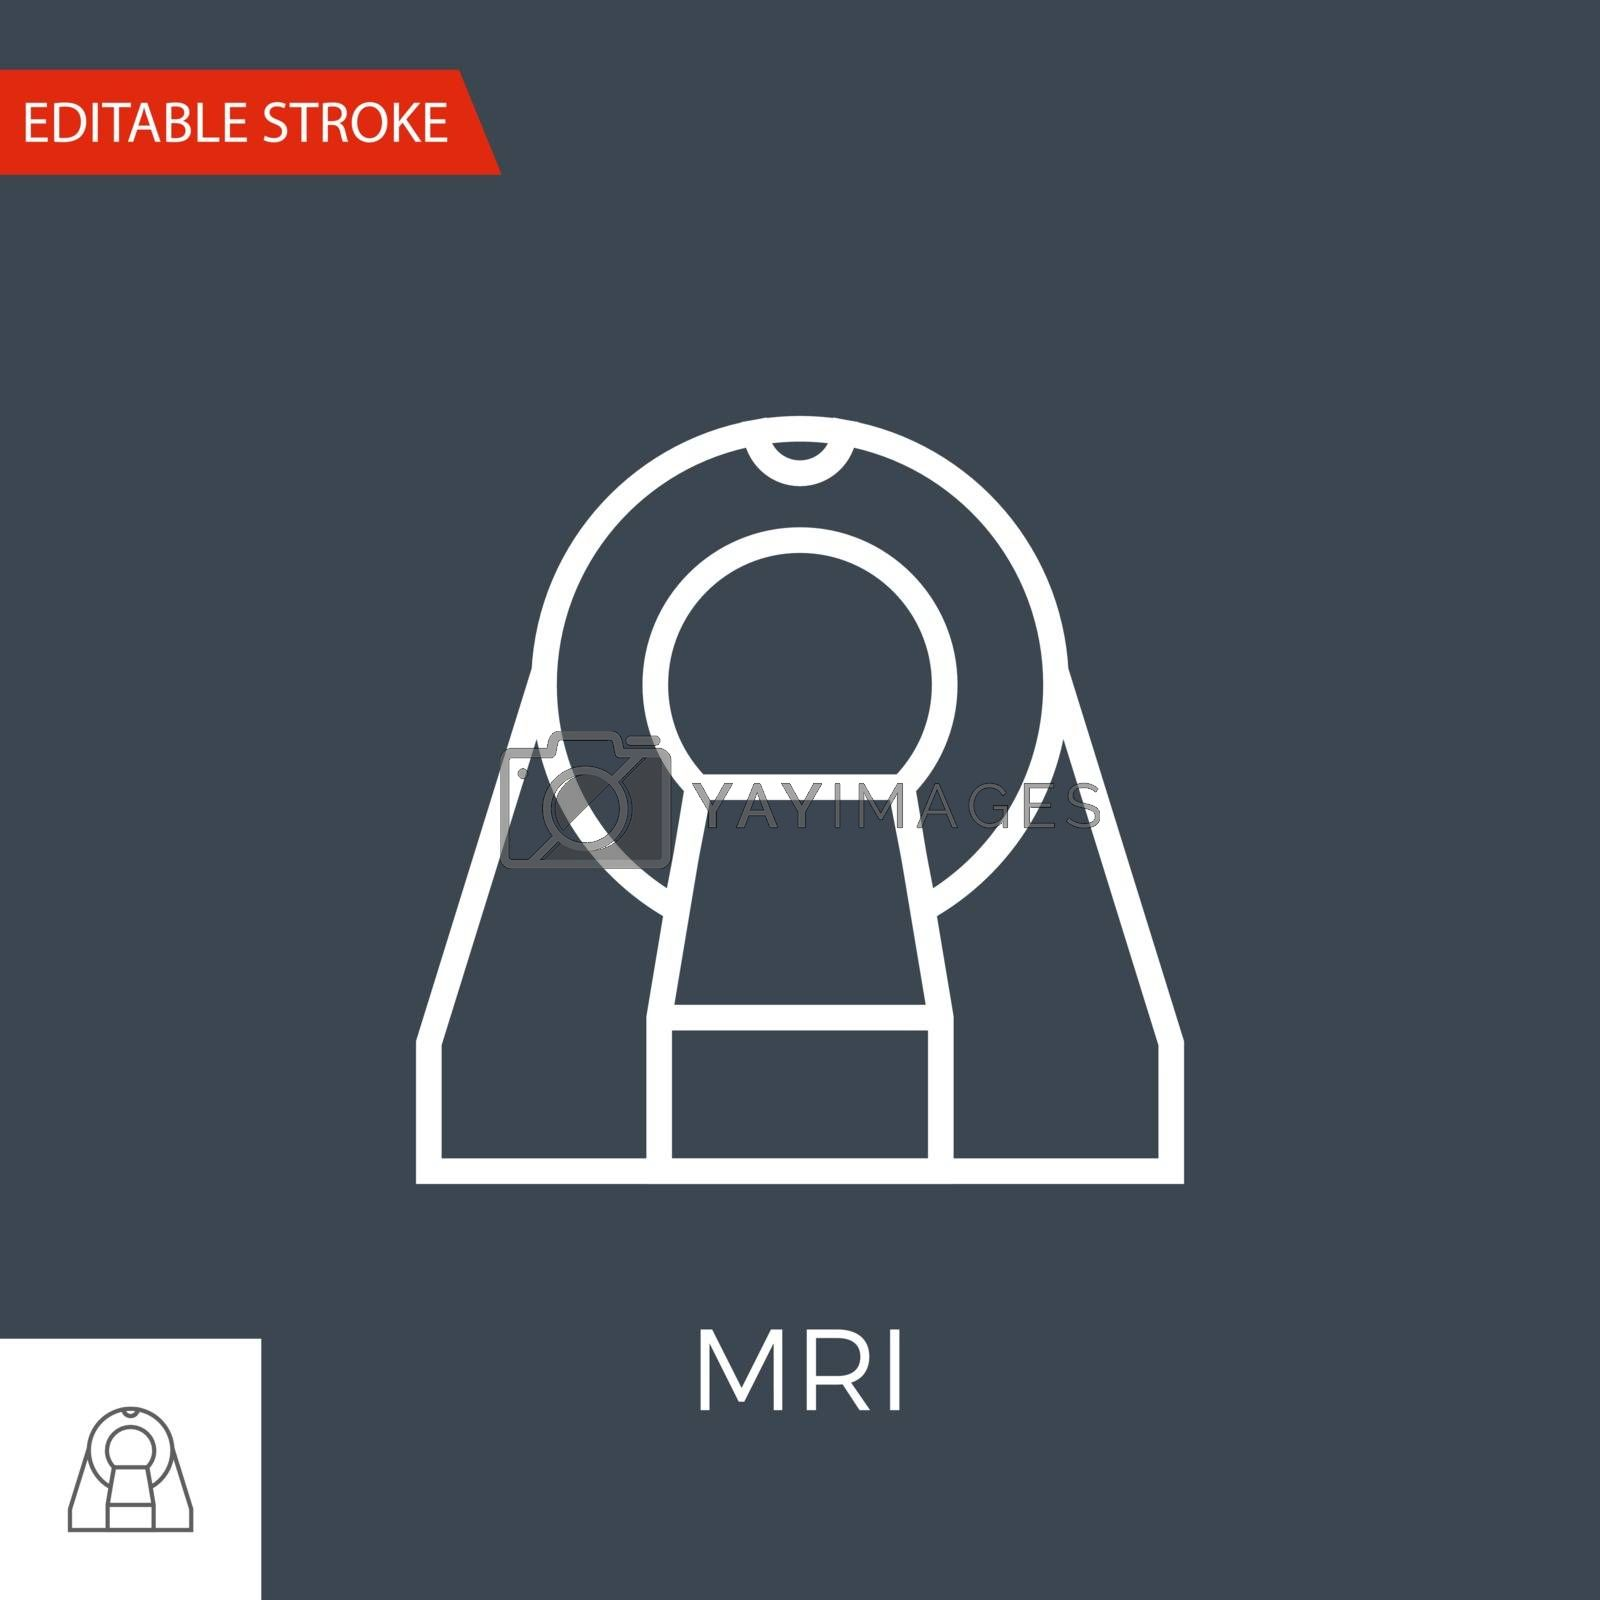 MRI Vector Icon by smoki